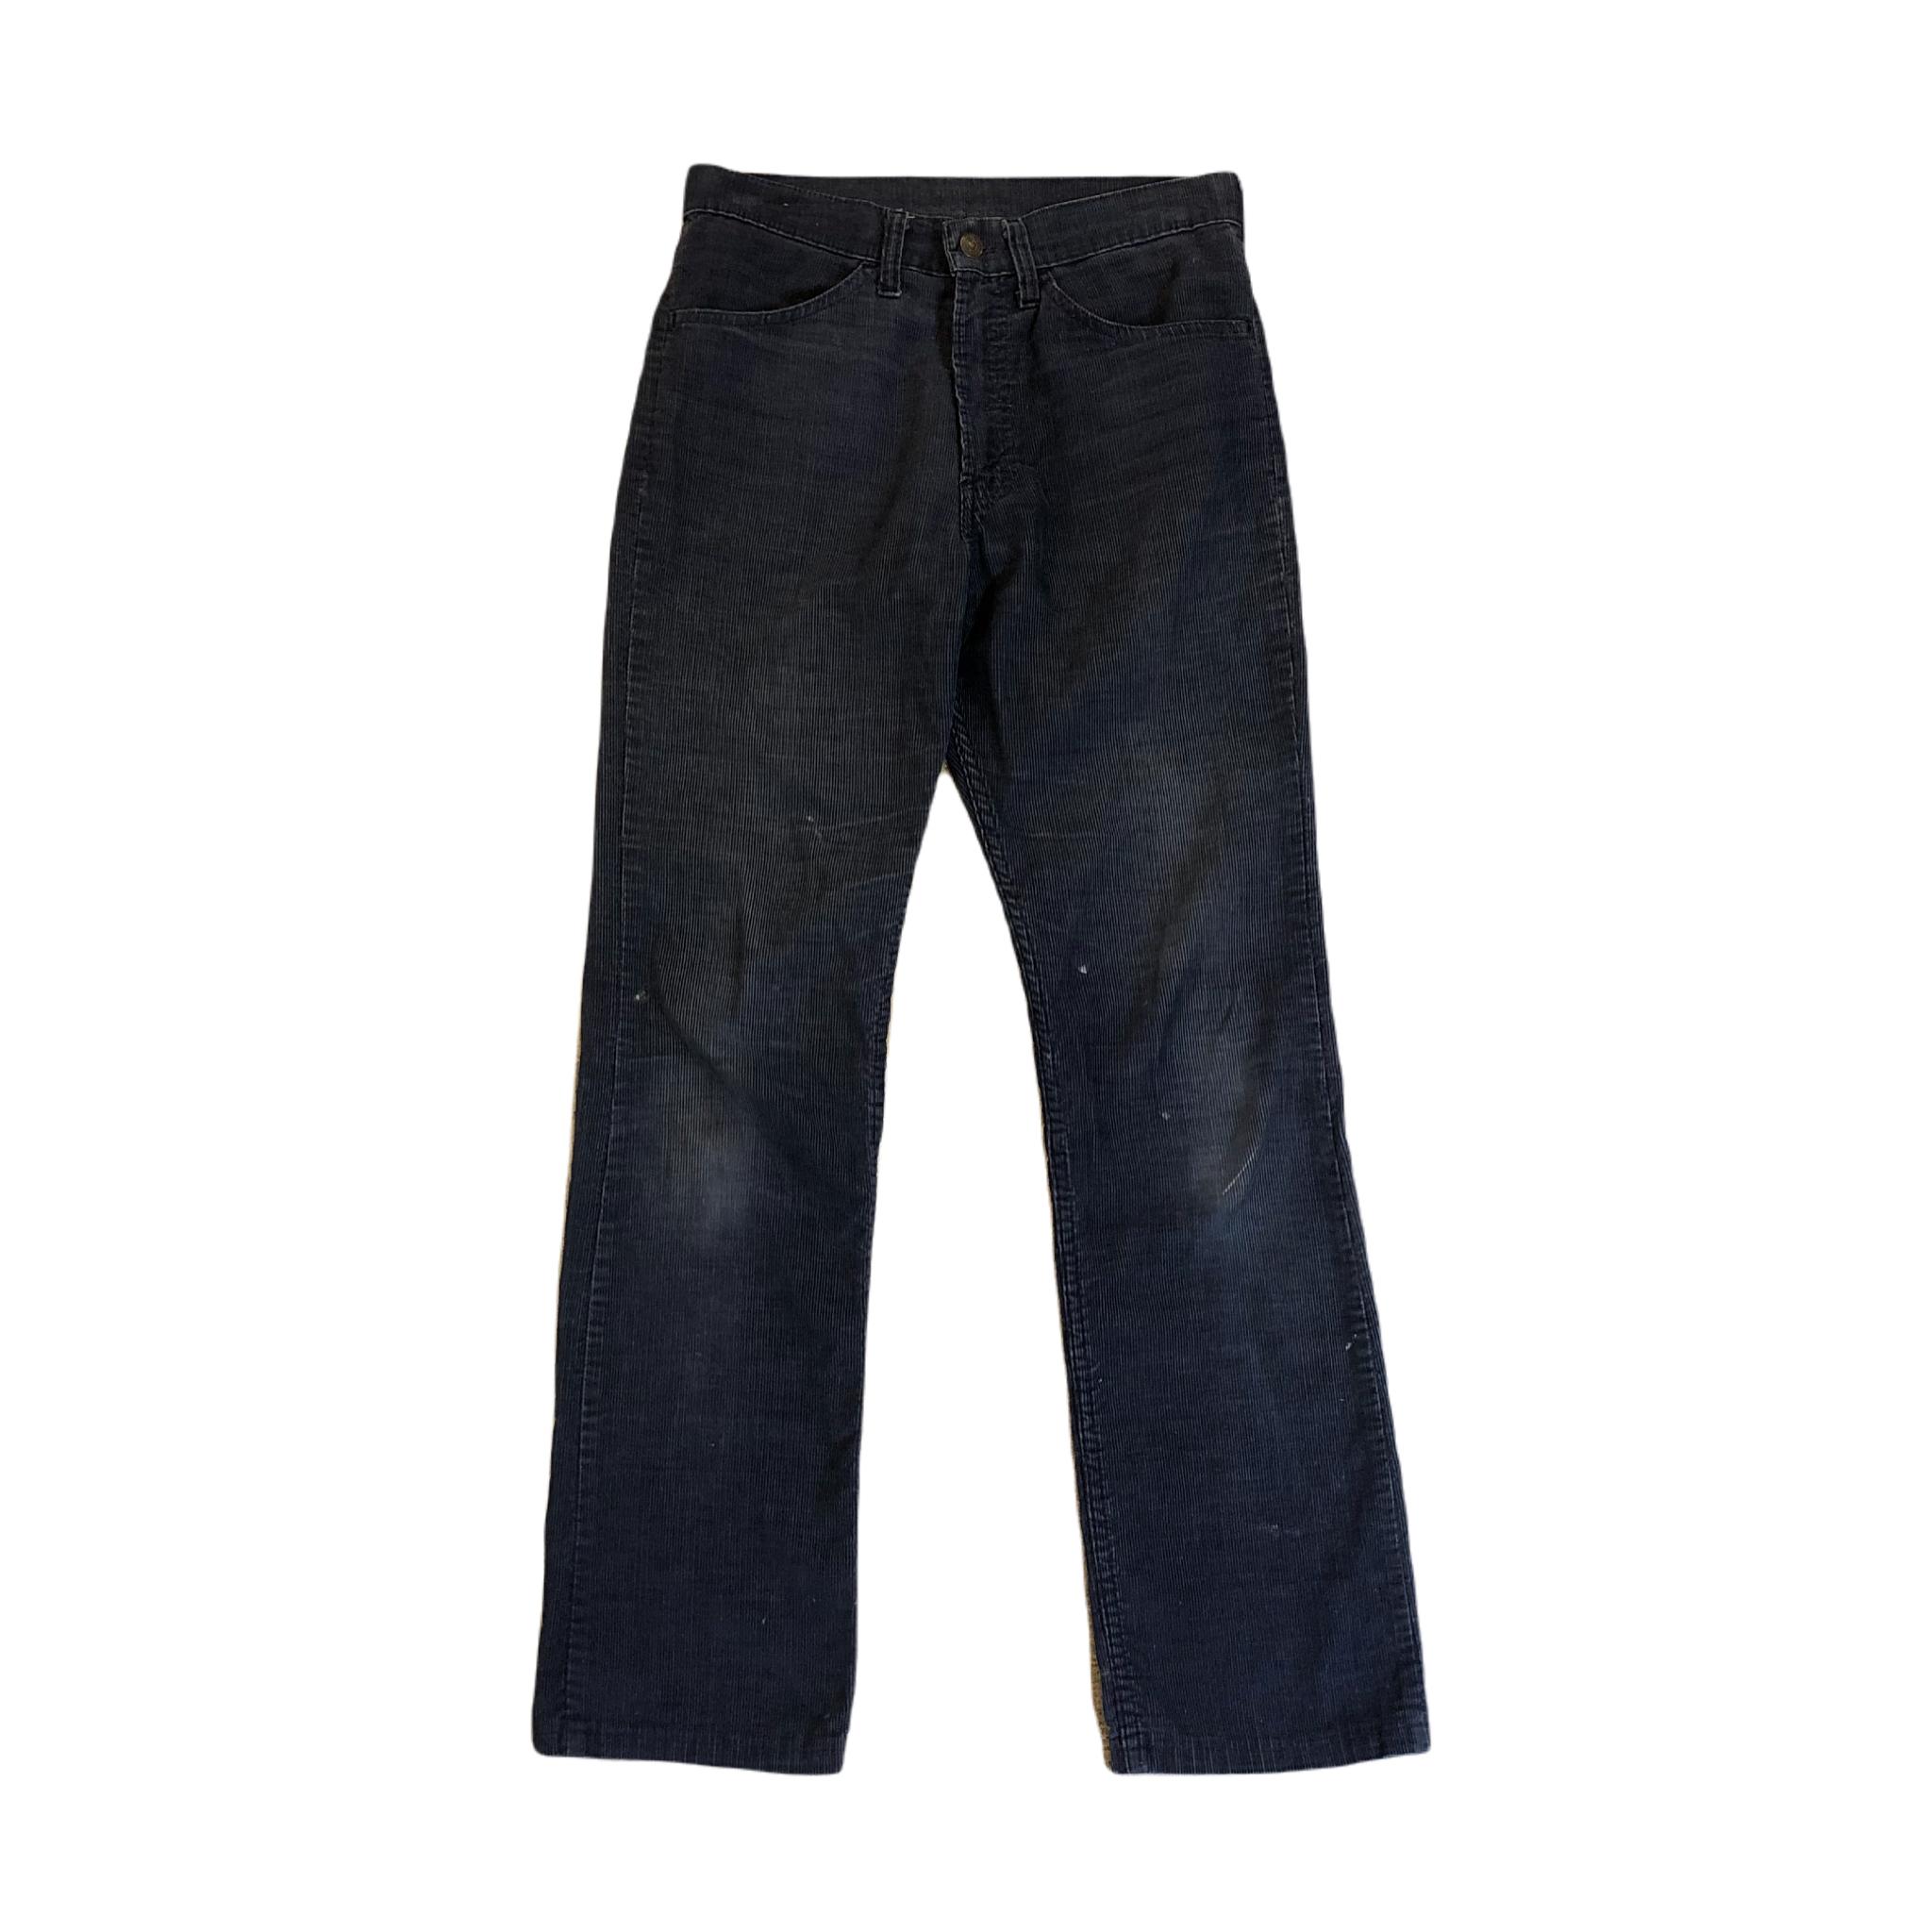 Levi's Corduroy Pants ¥6,400+tax